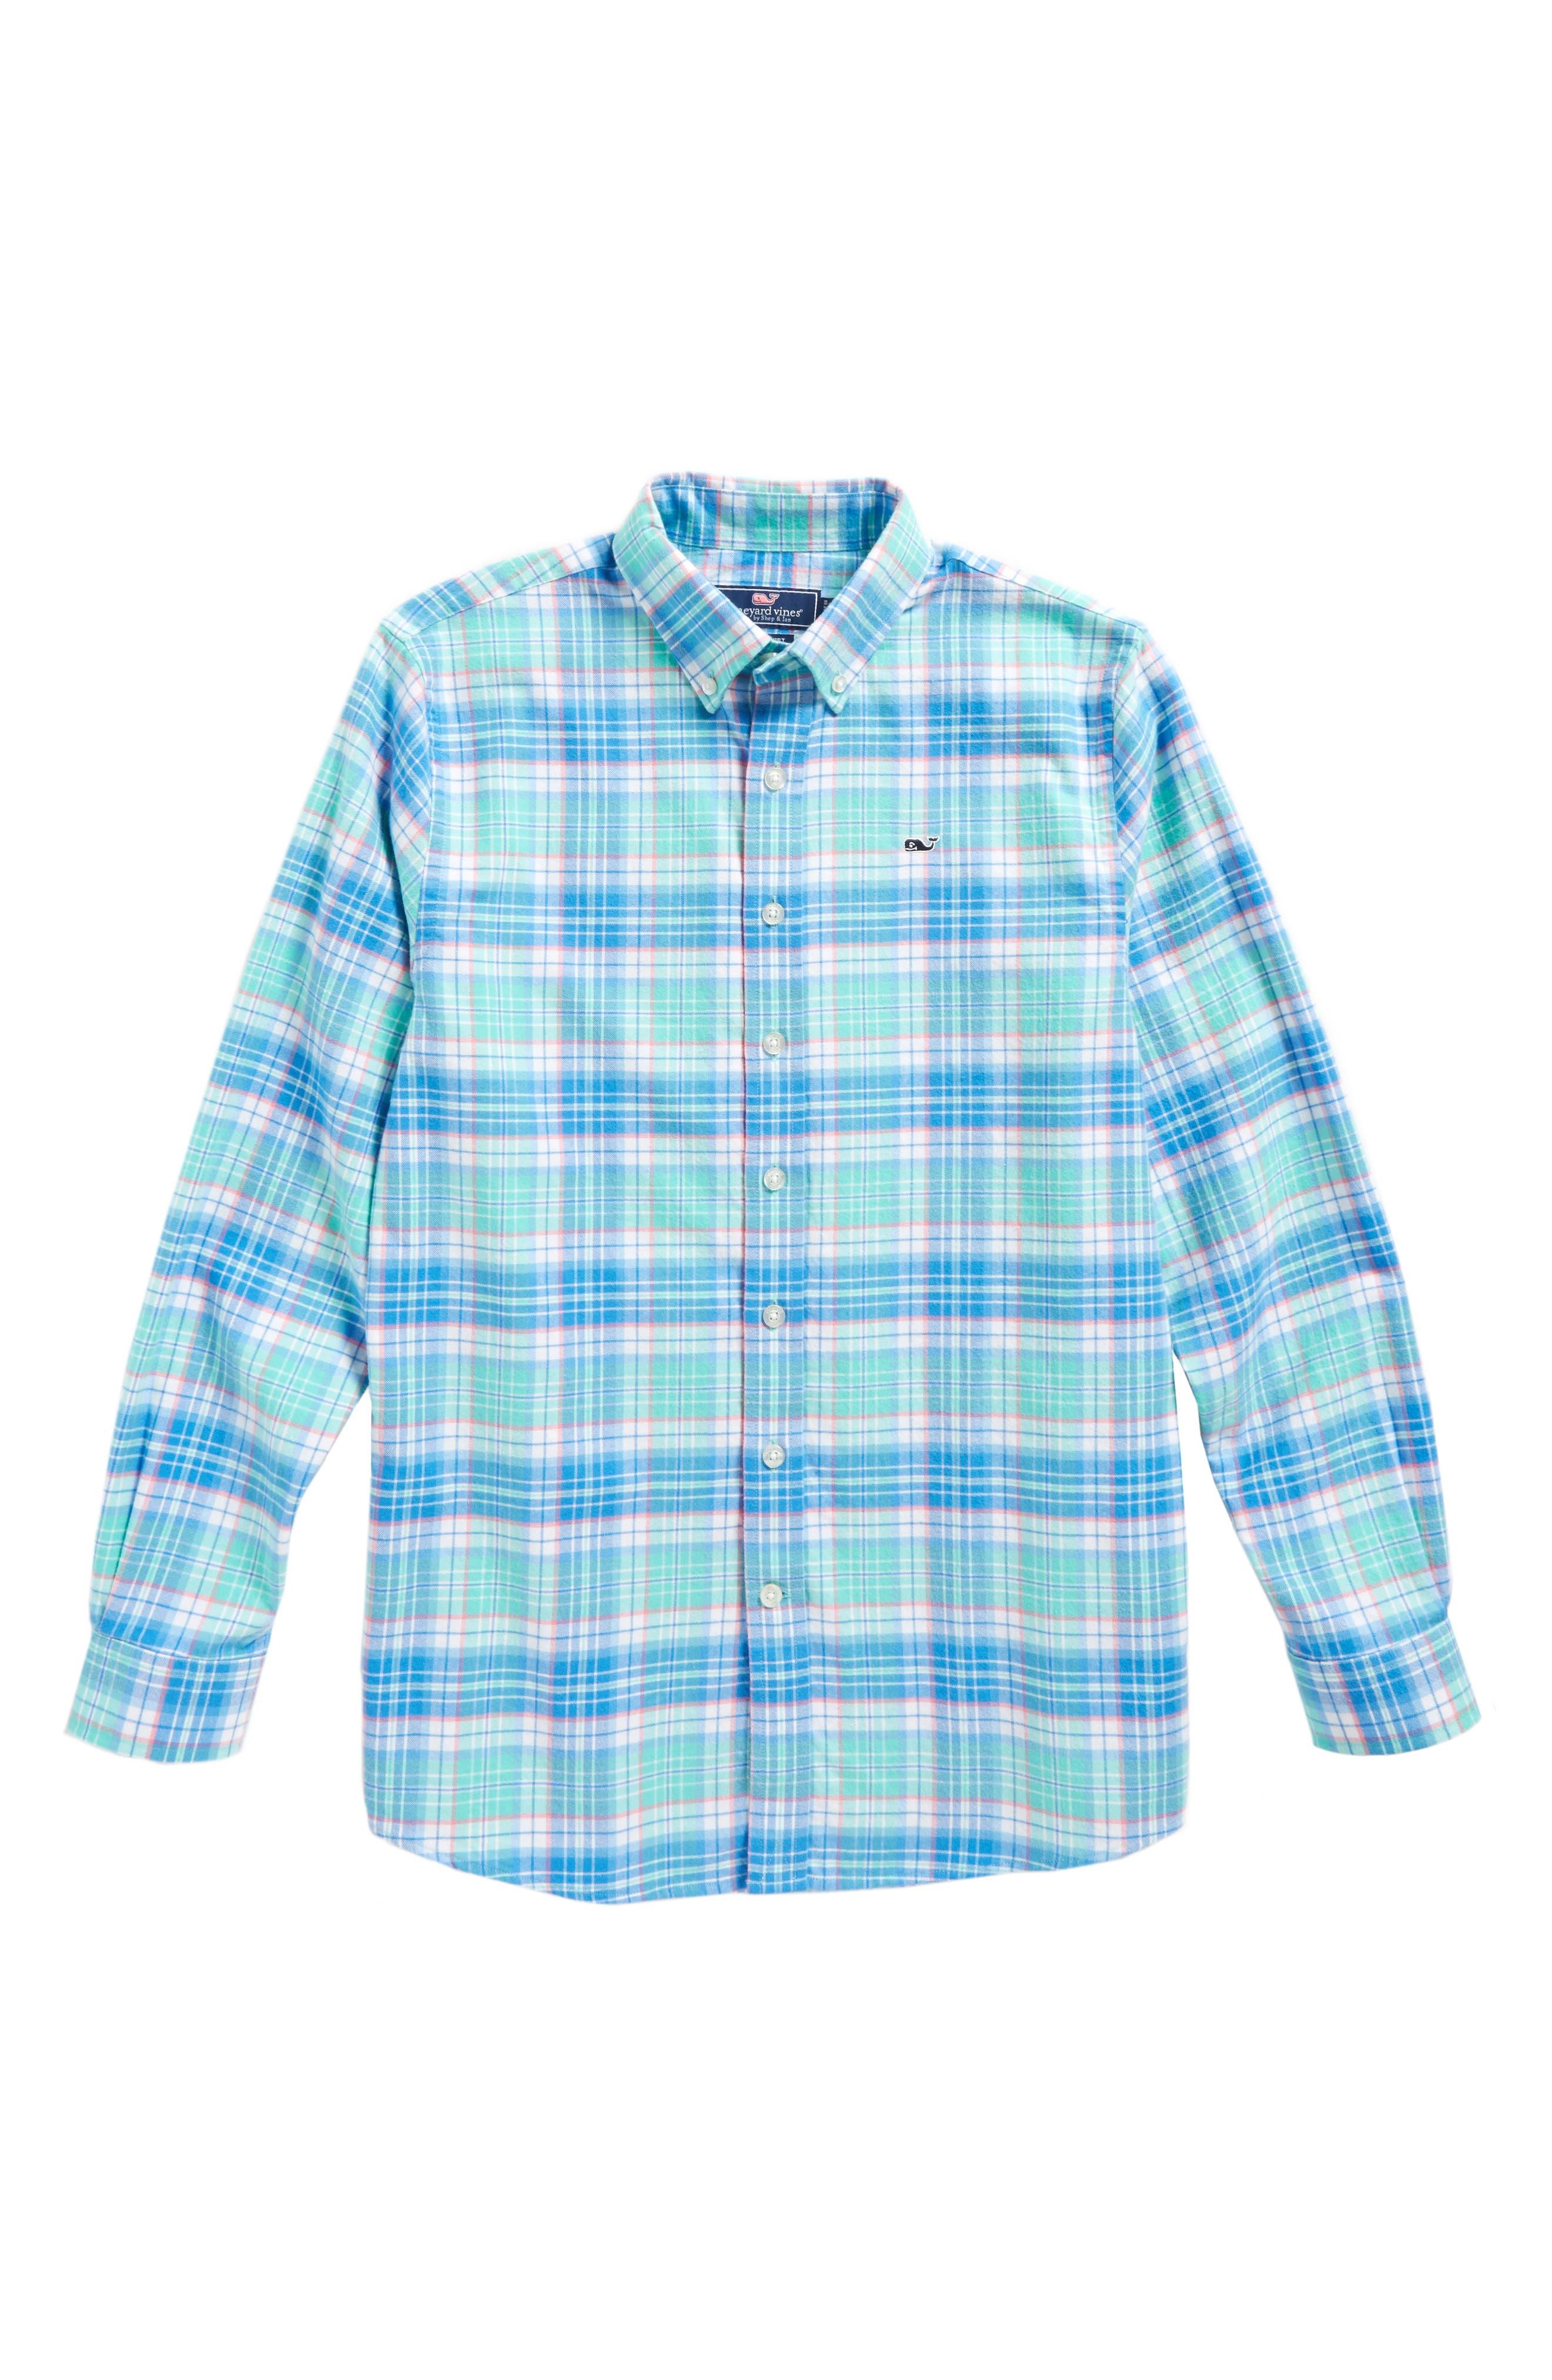 vineyard vines Sandspar Plaid Whale Flannel Shirt (Big Boys)